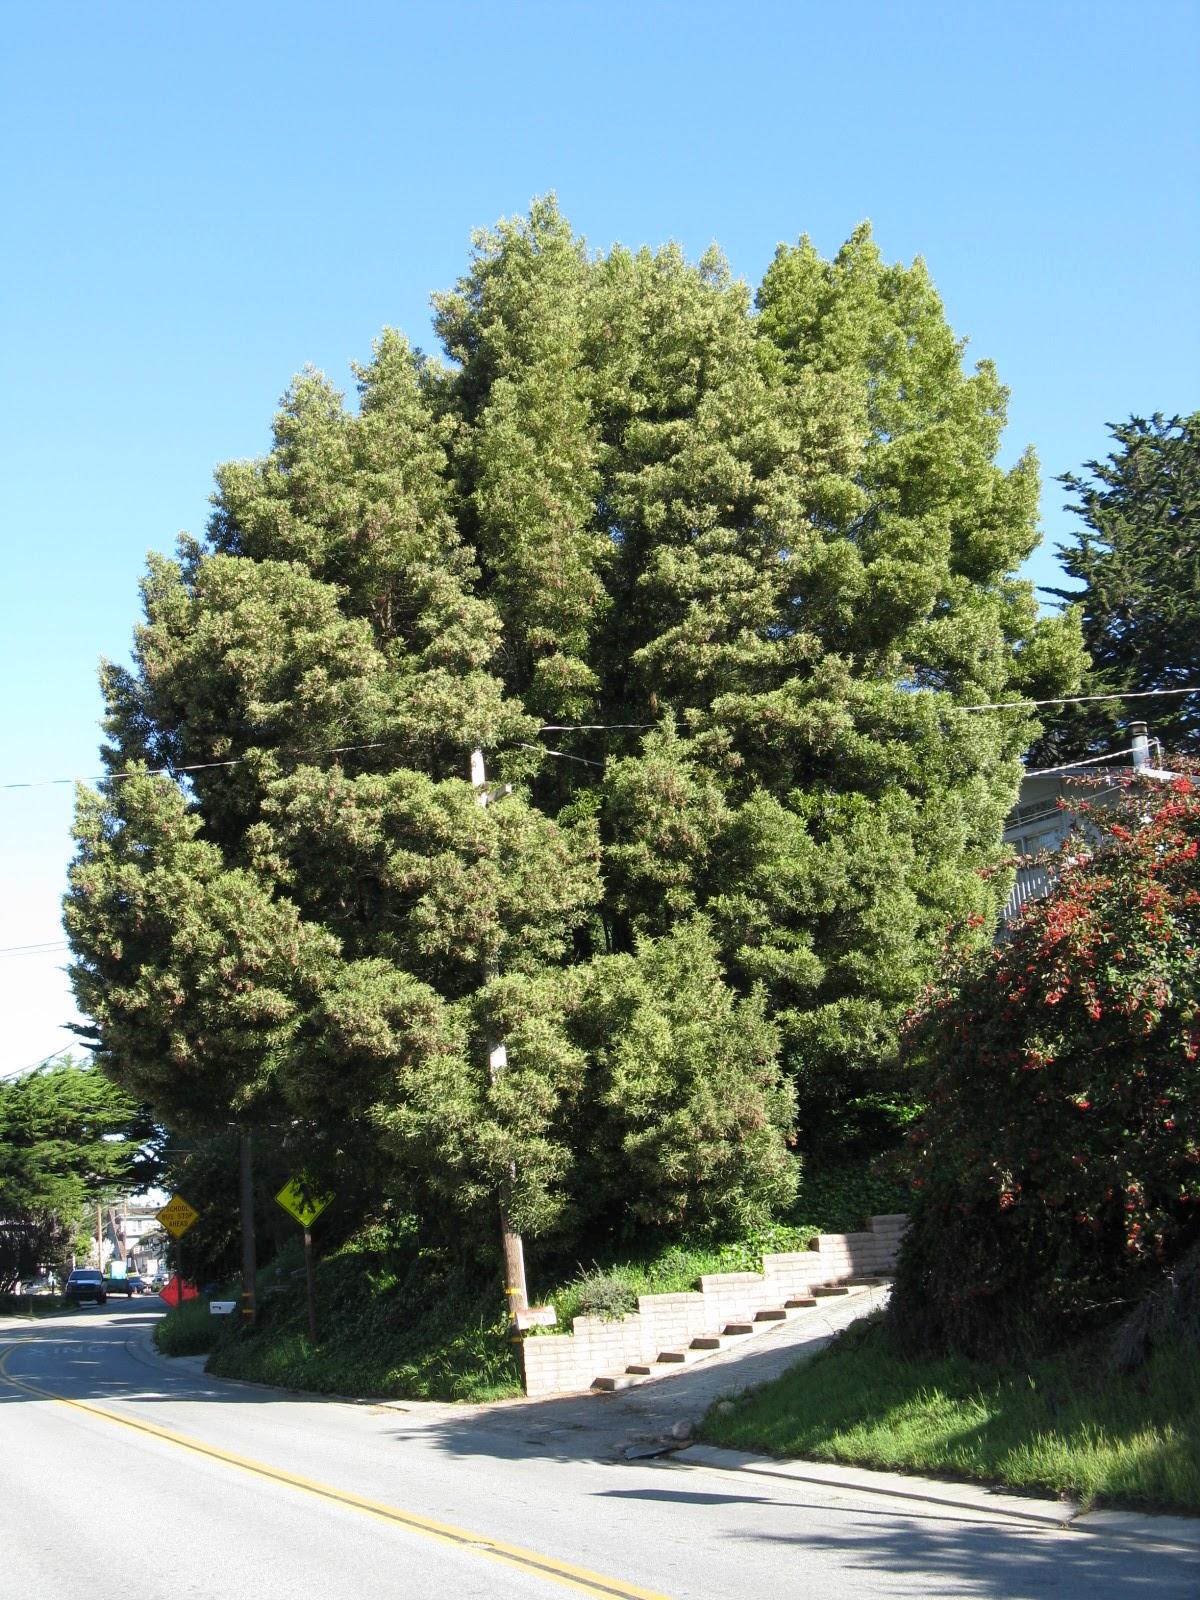 trees of santa cruz county march 2011